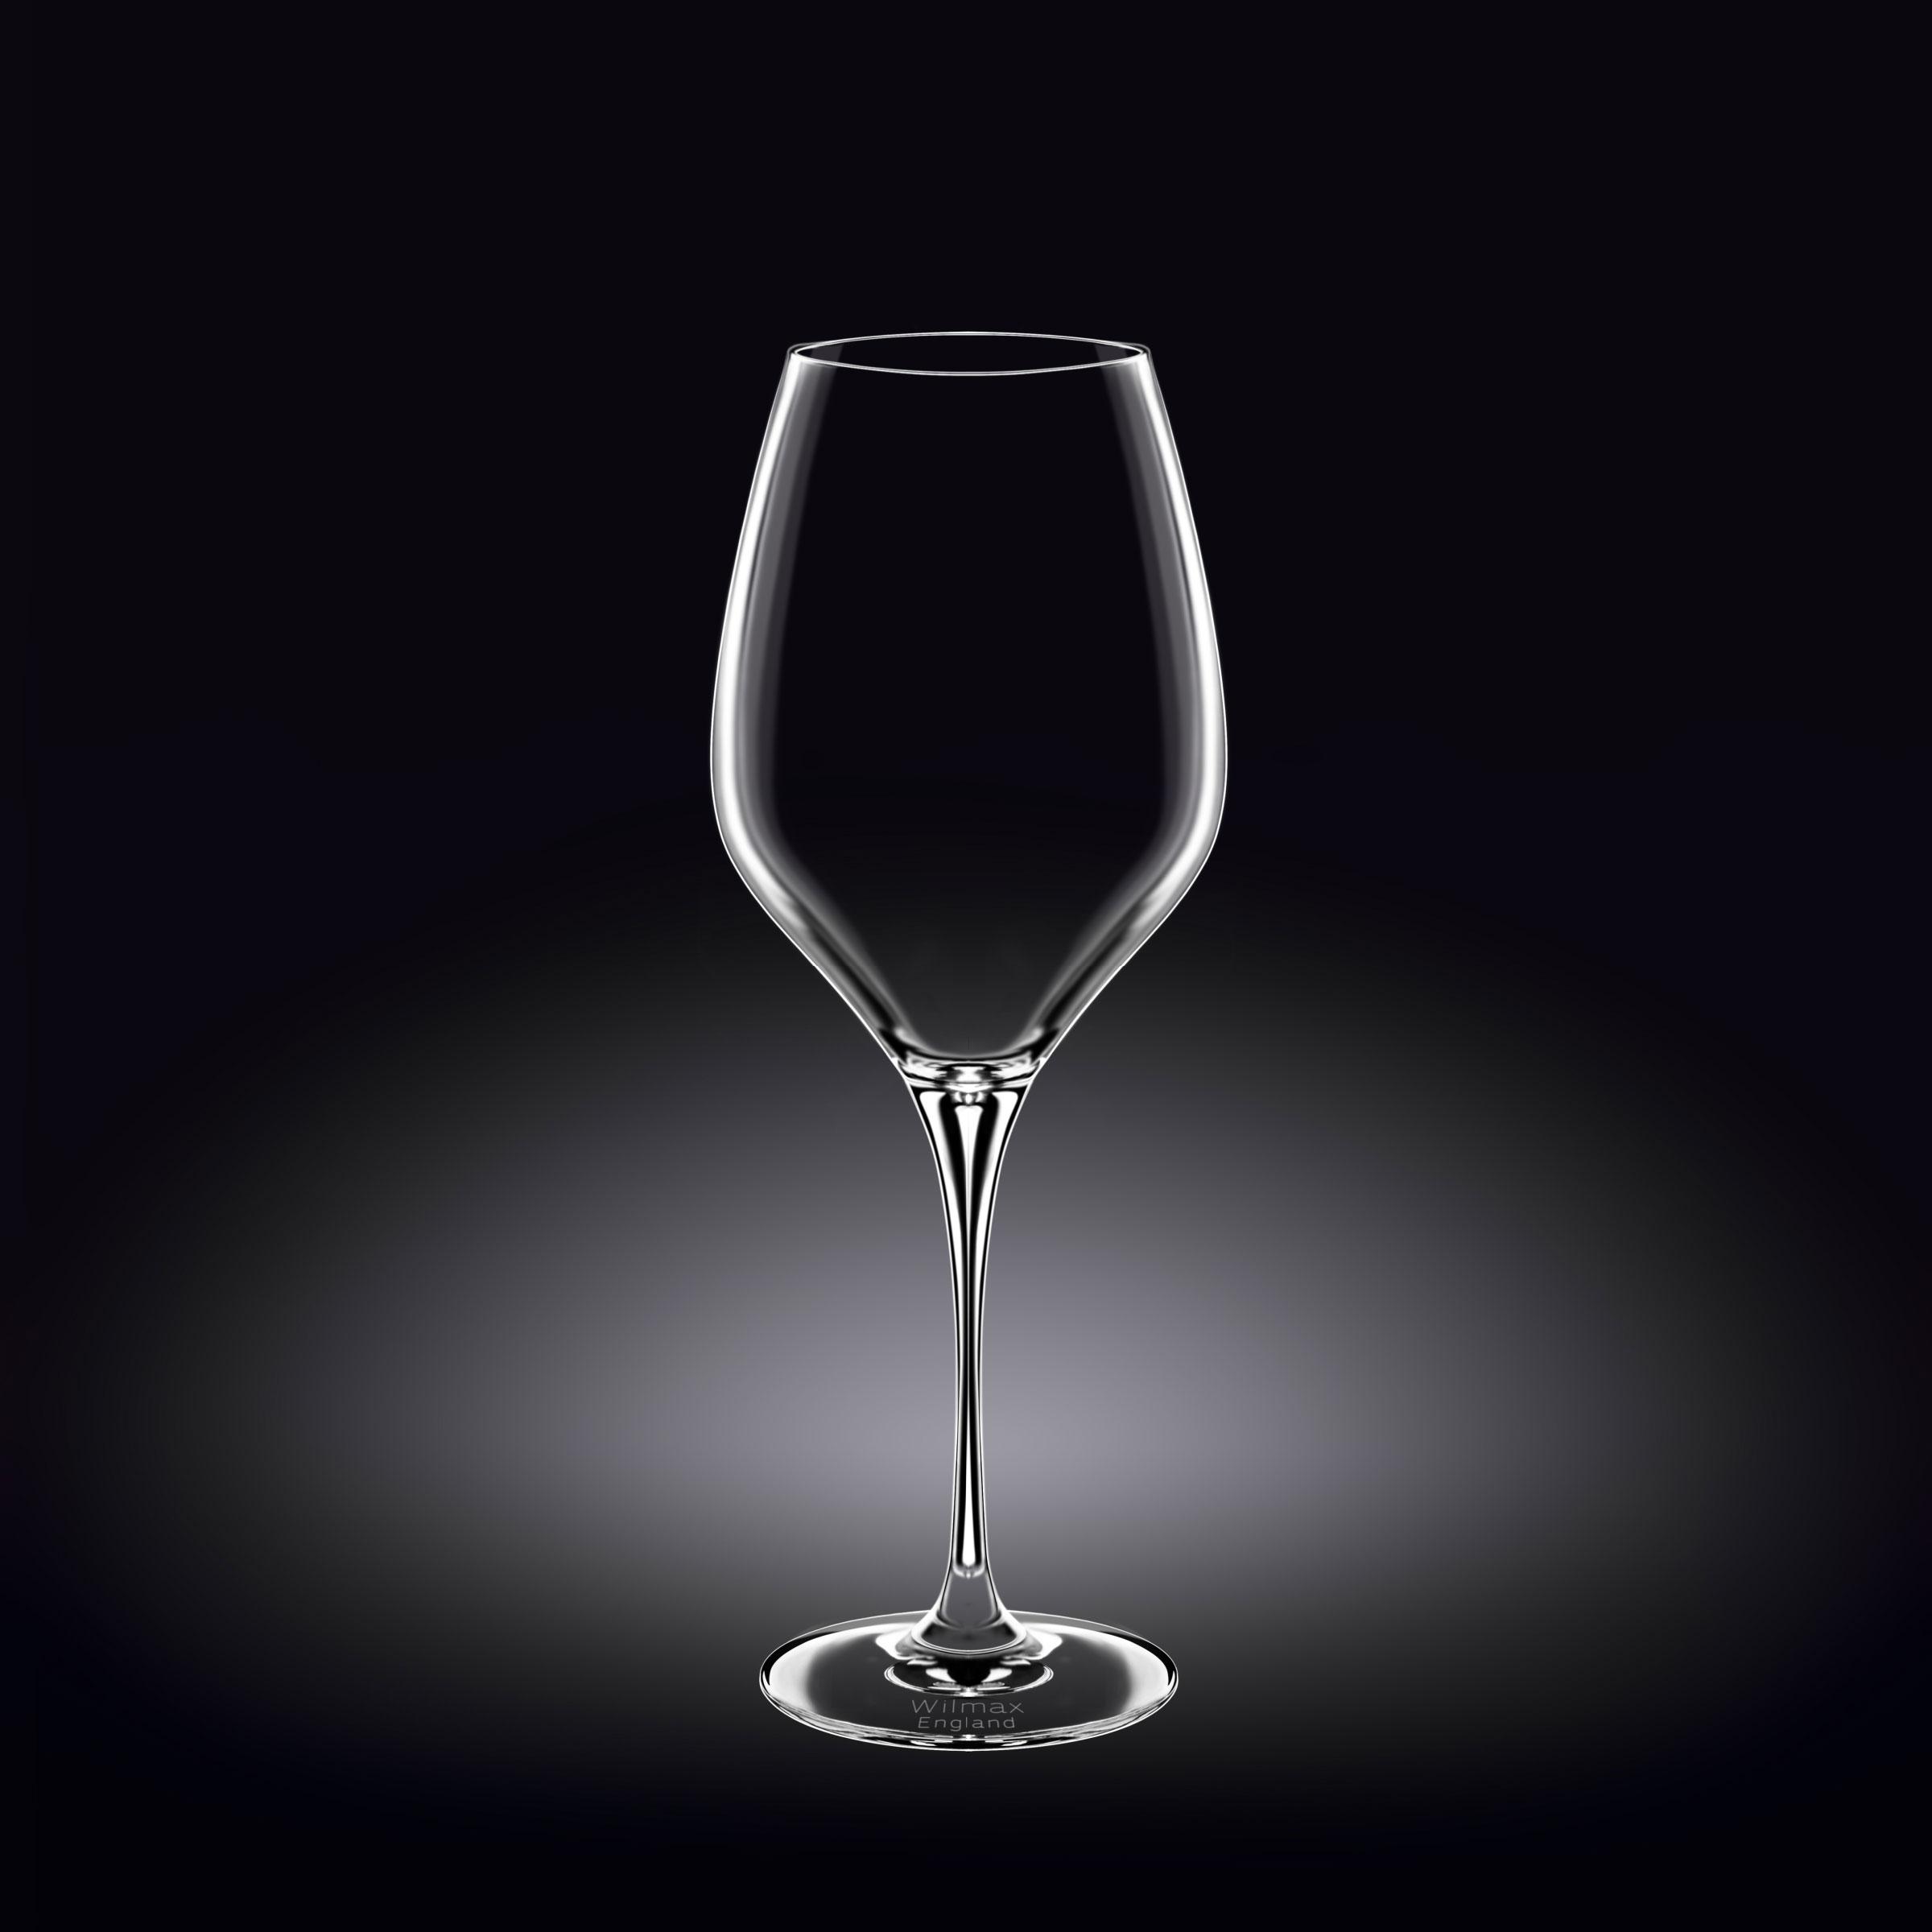 【Wilmax England】 ~Julia Collection~ワイングラス2Pセット <br>No.32063